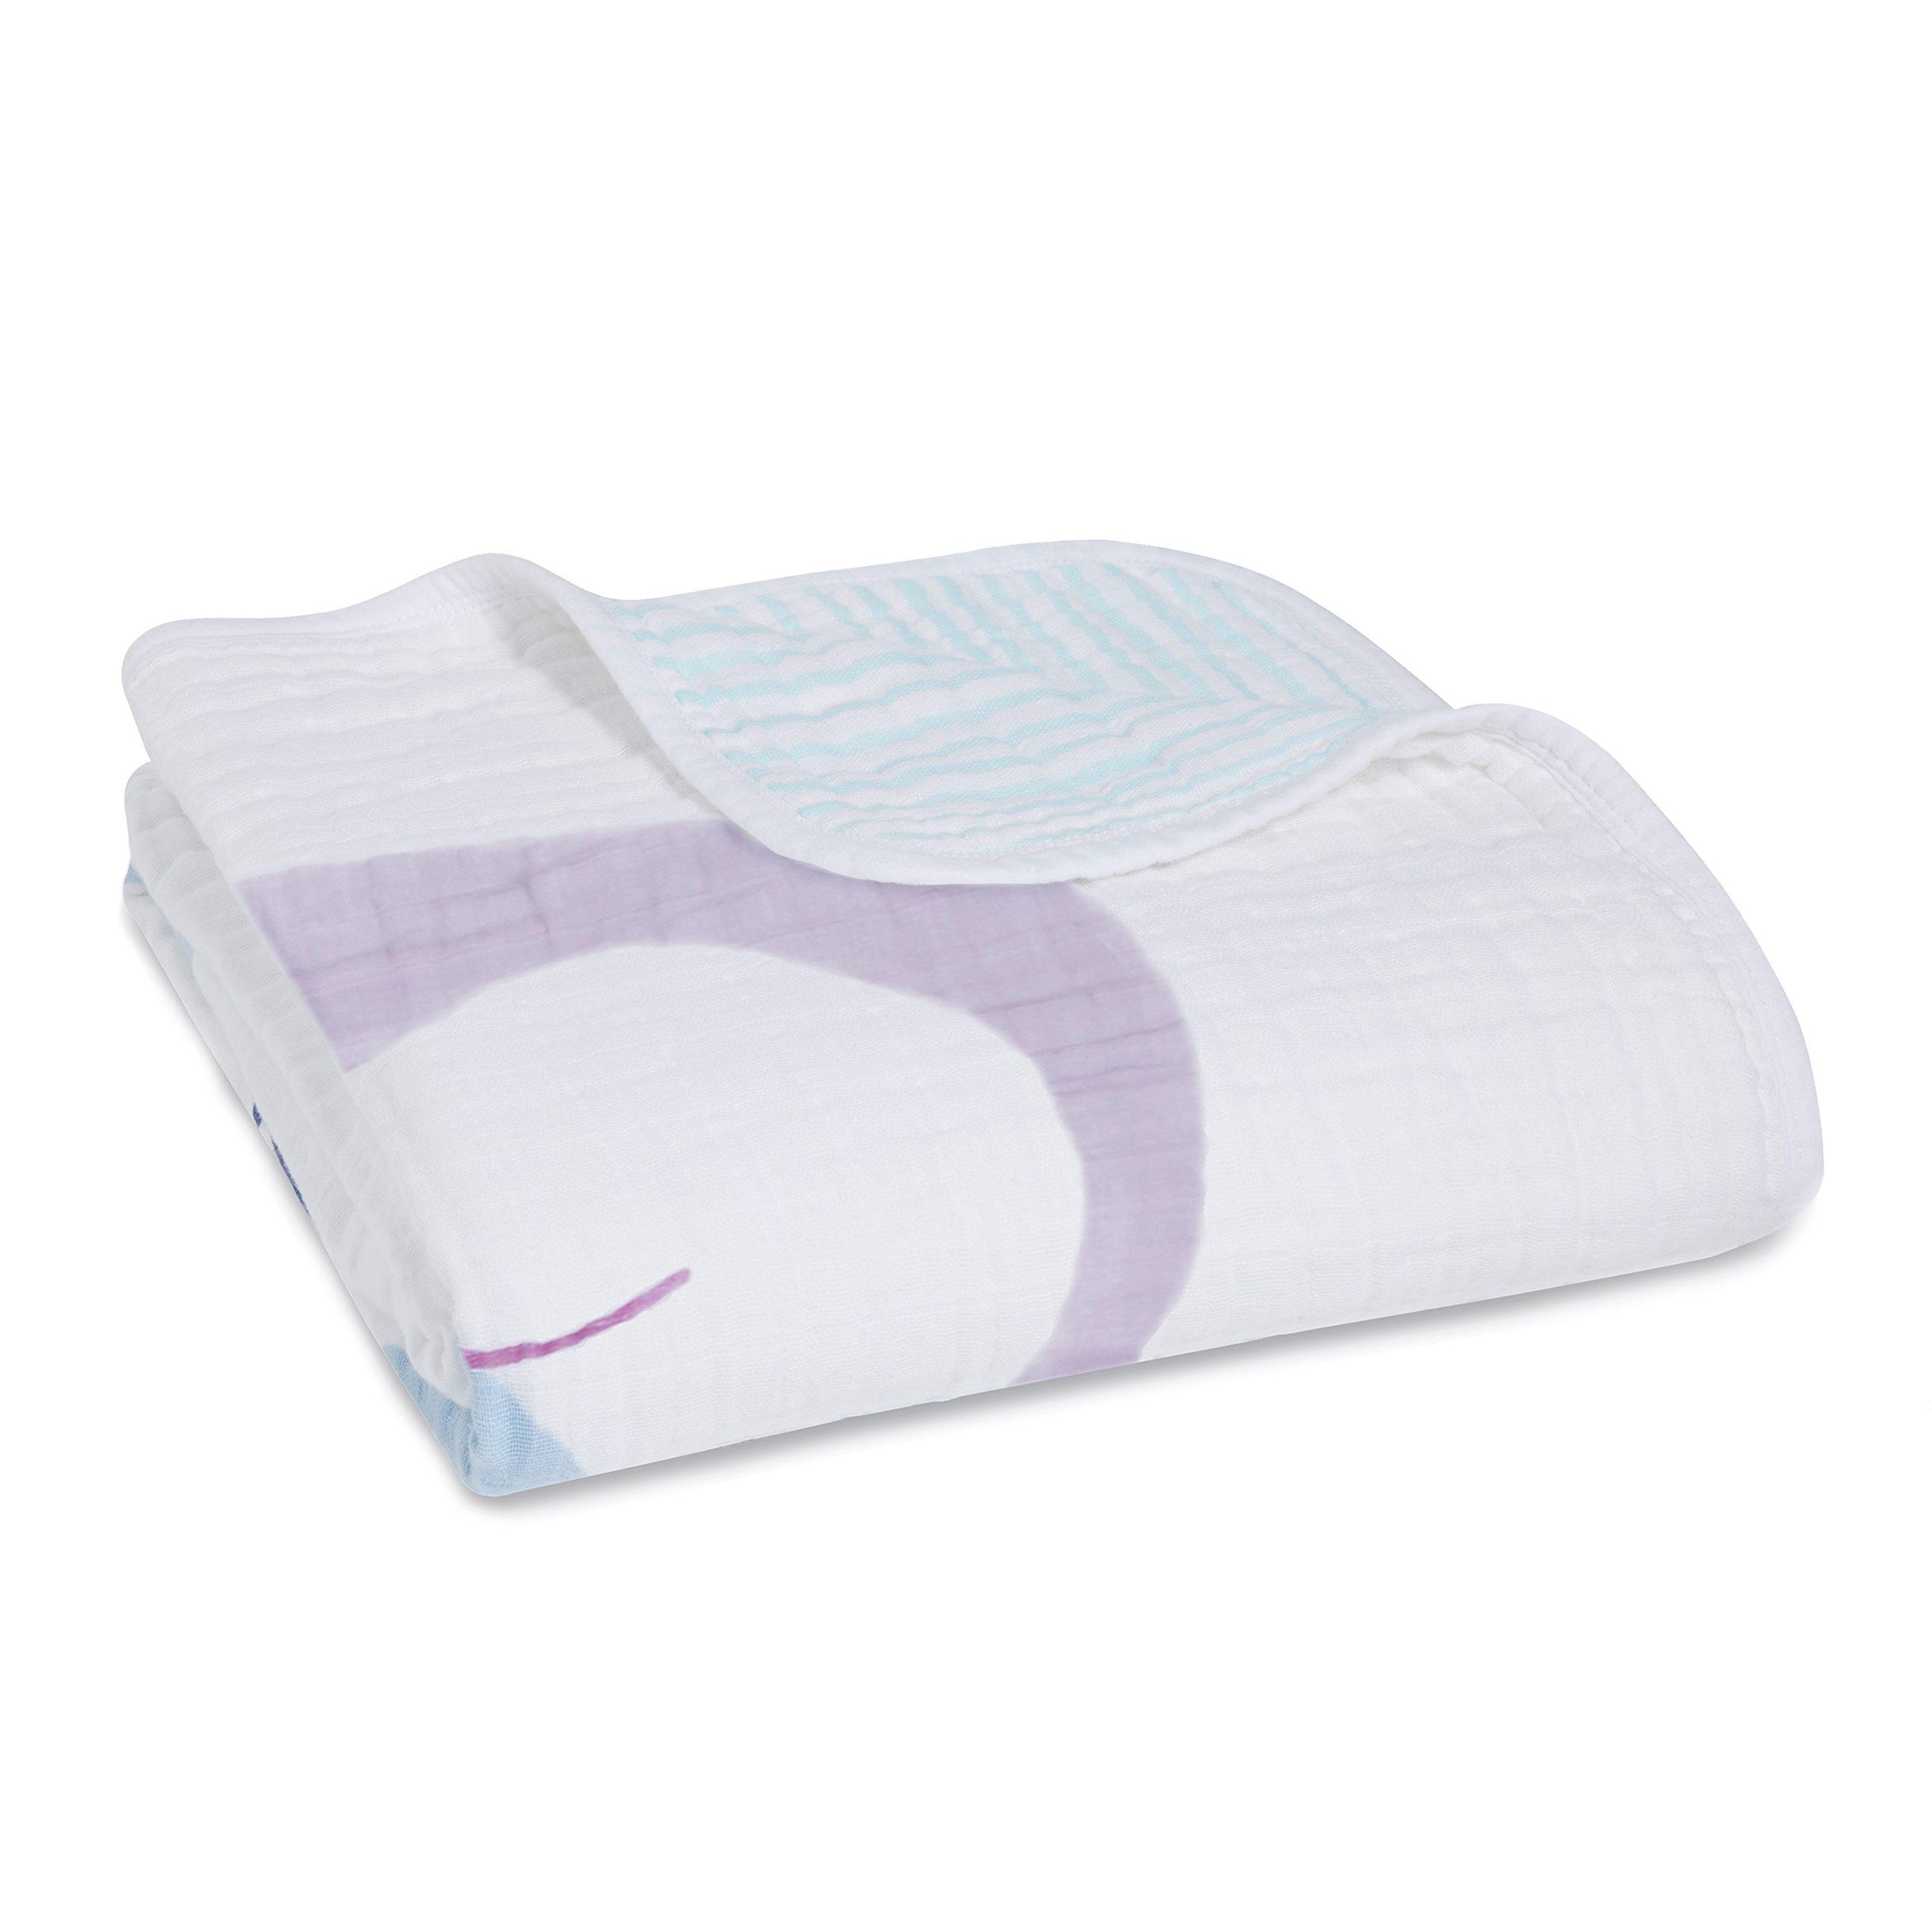 aden + anais dream blanket, thistle-owlish